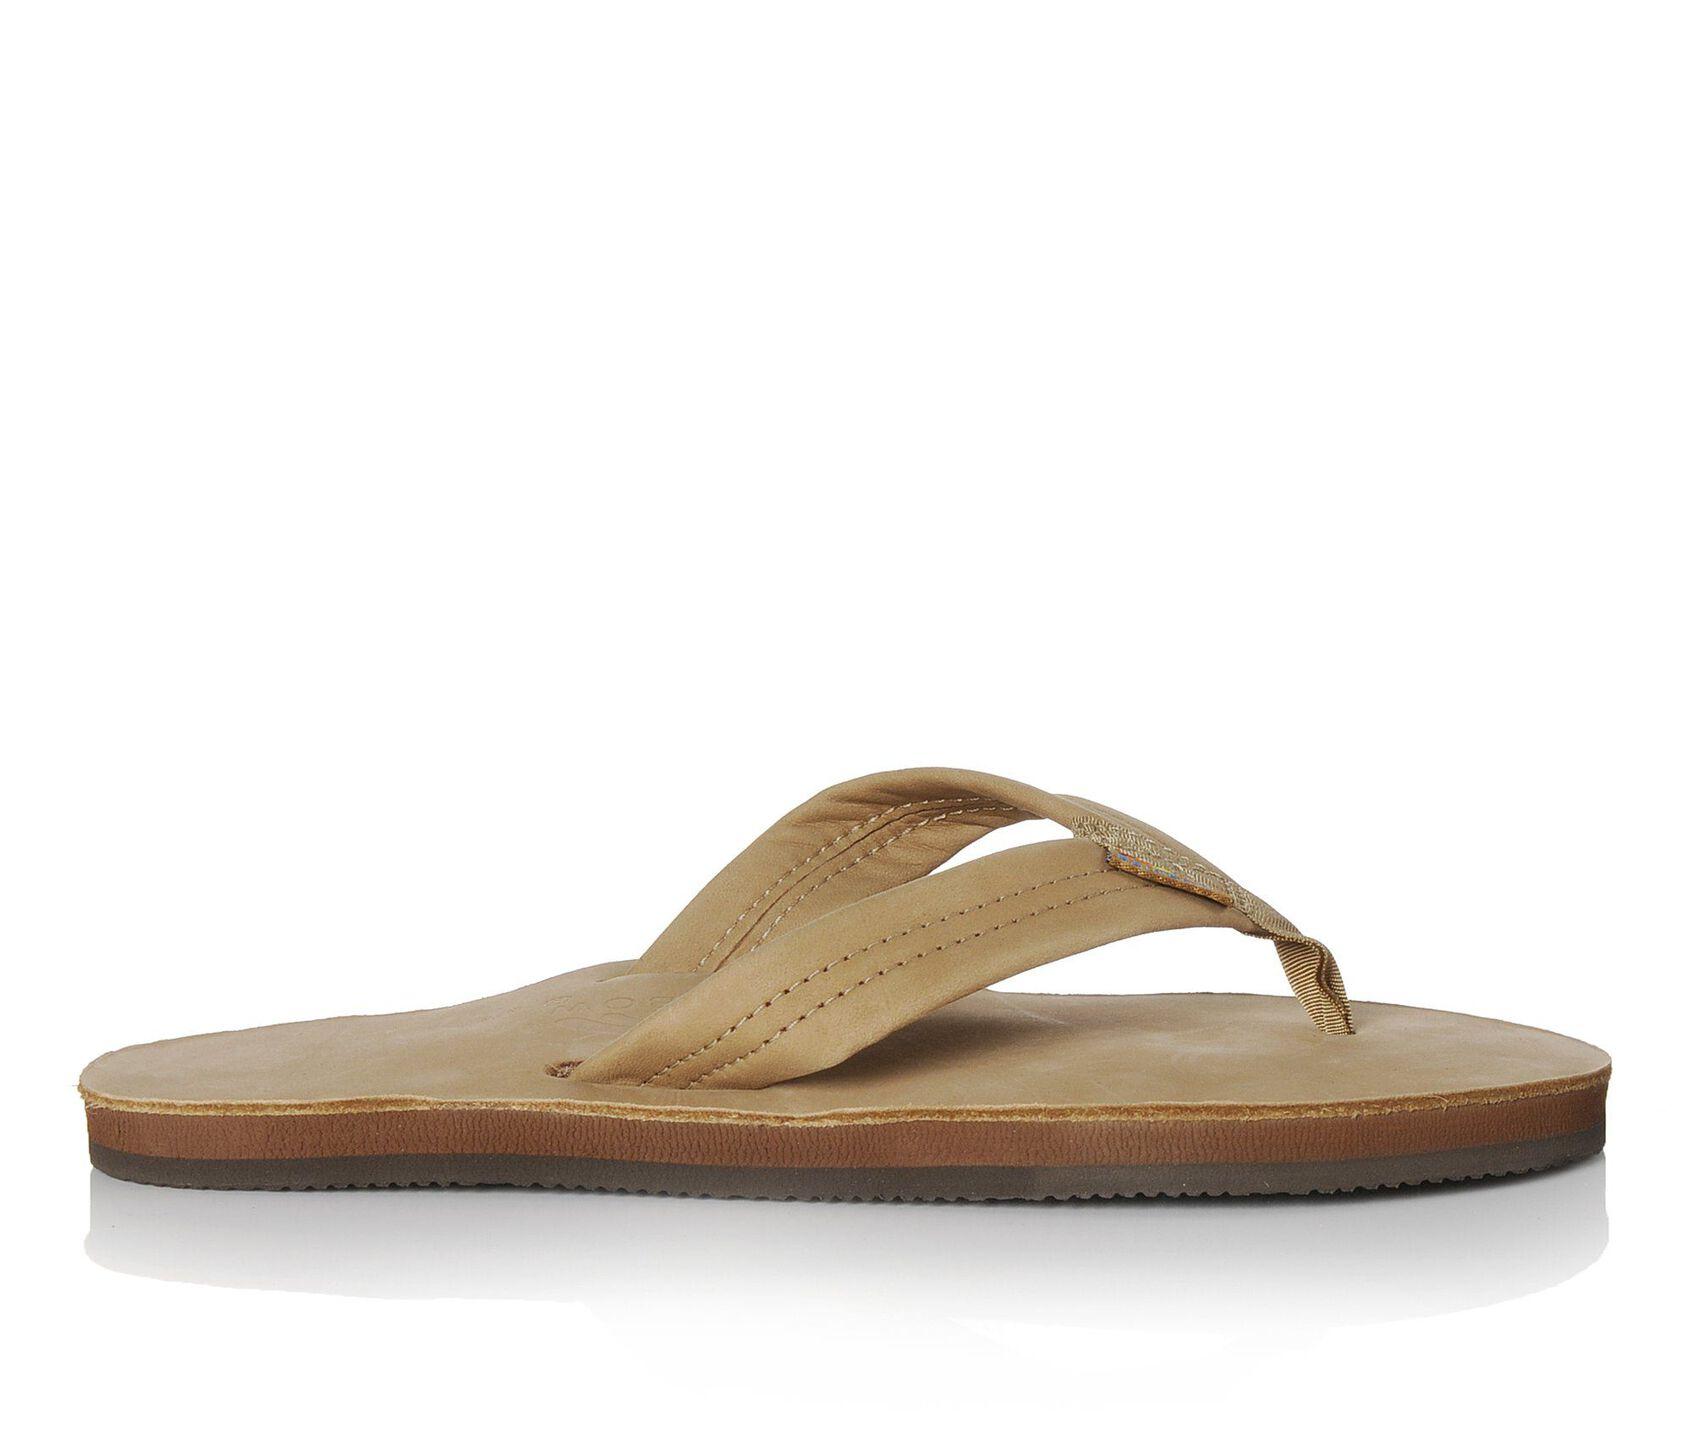 9ece27eed81 ... Rainbow Sandals 301 - Premium Single Flip-Flops. Previous